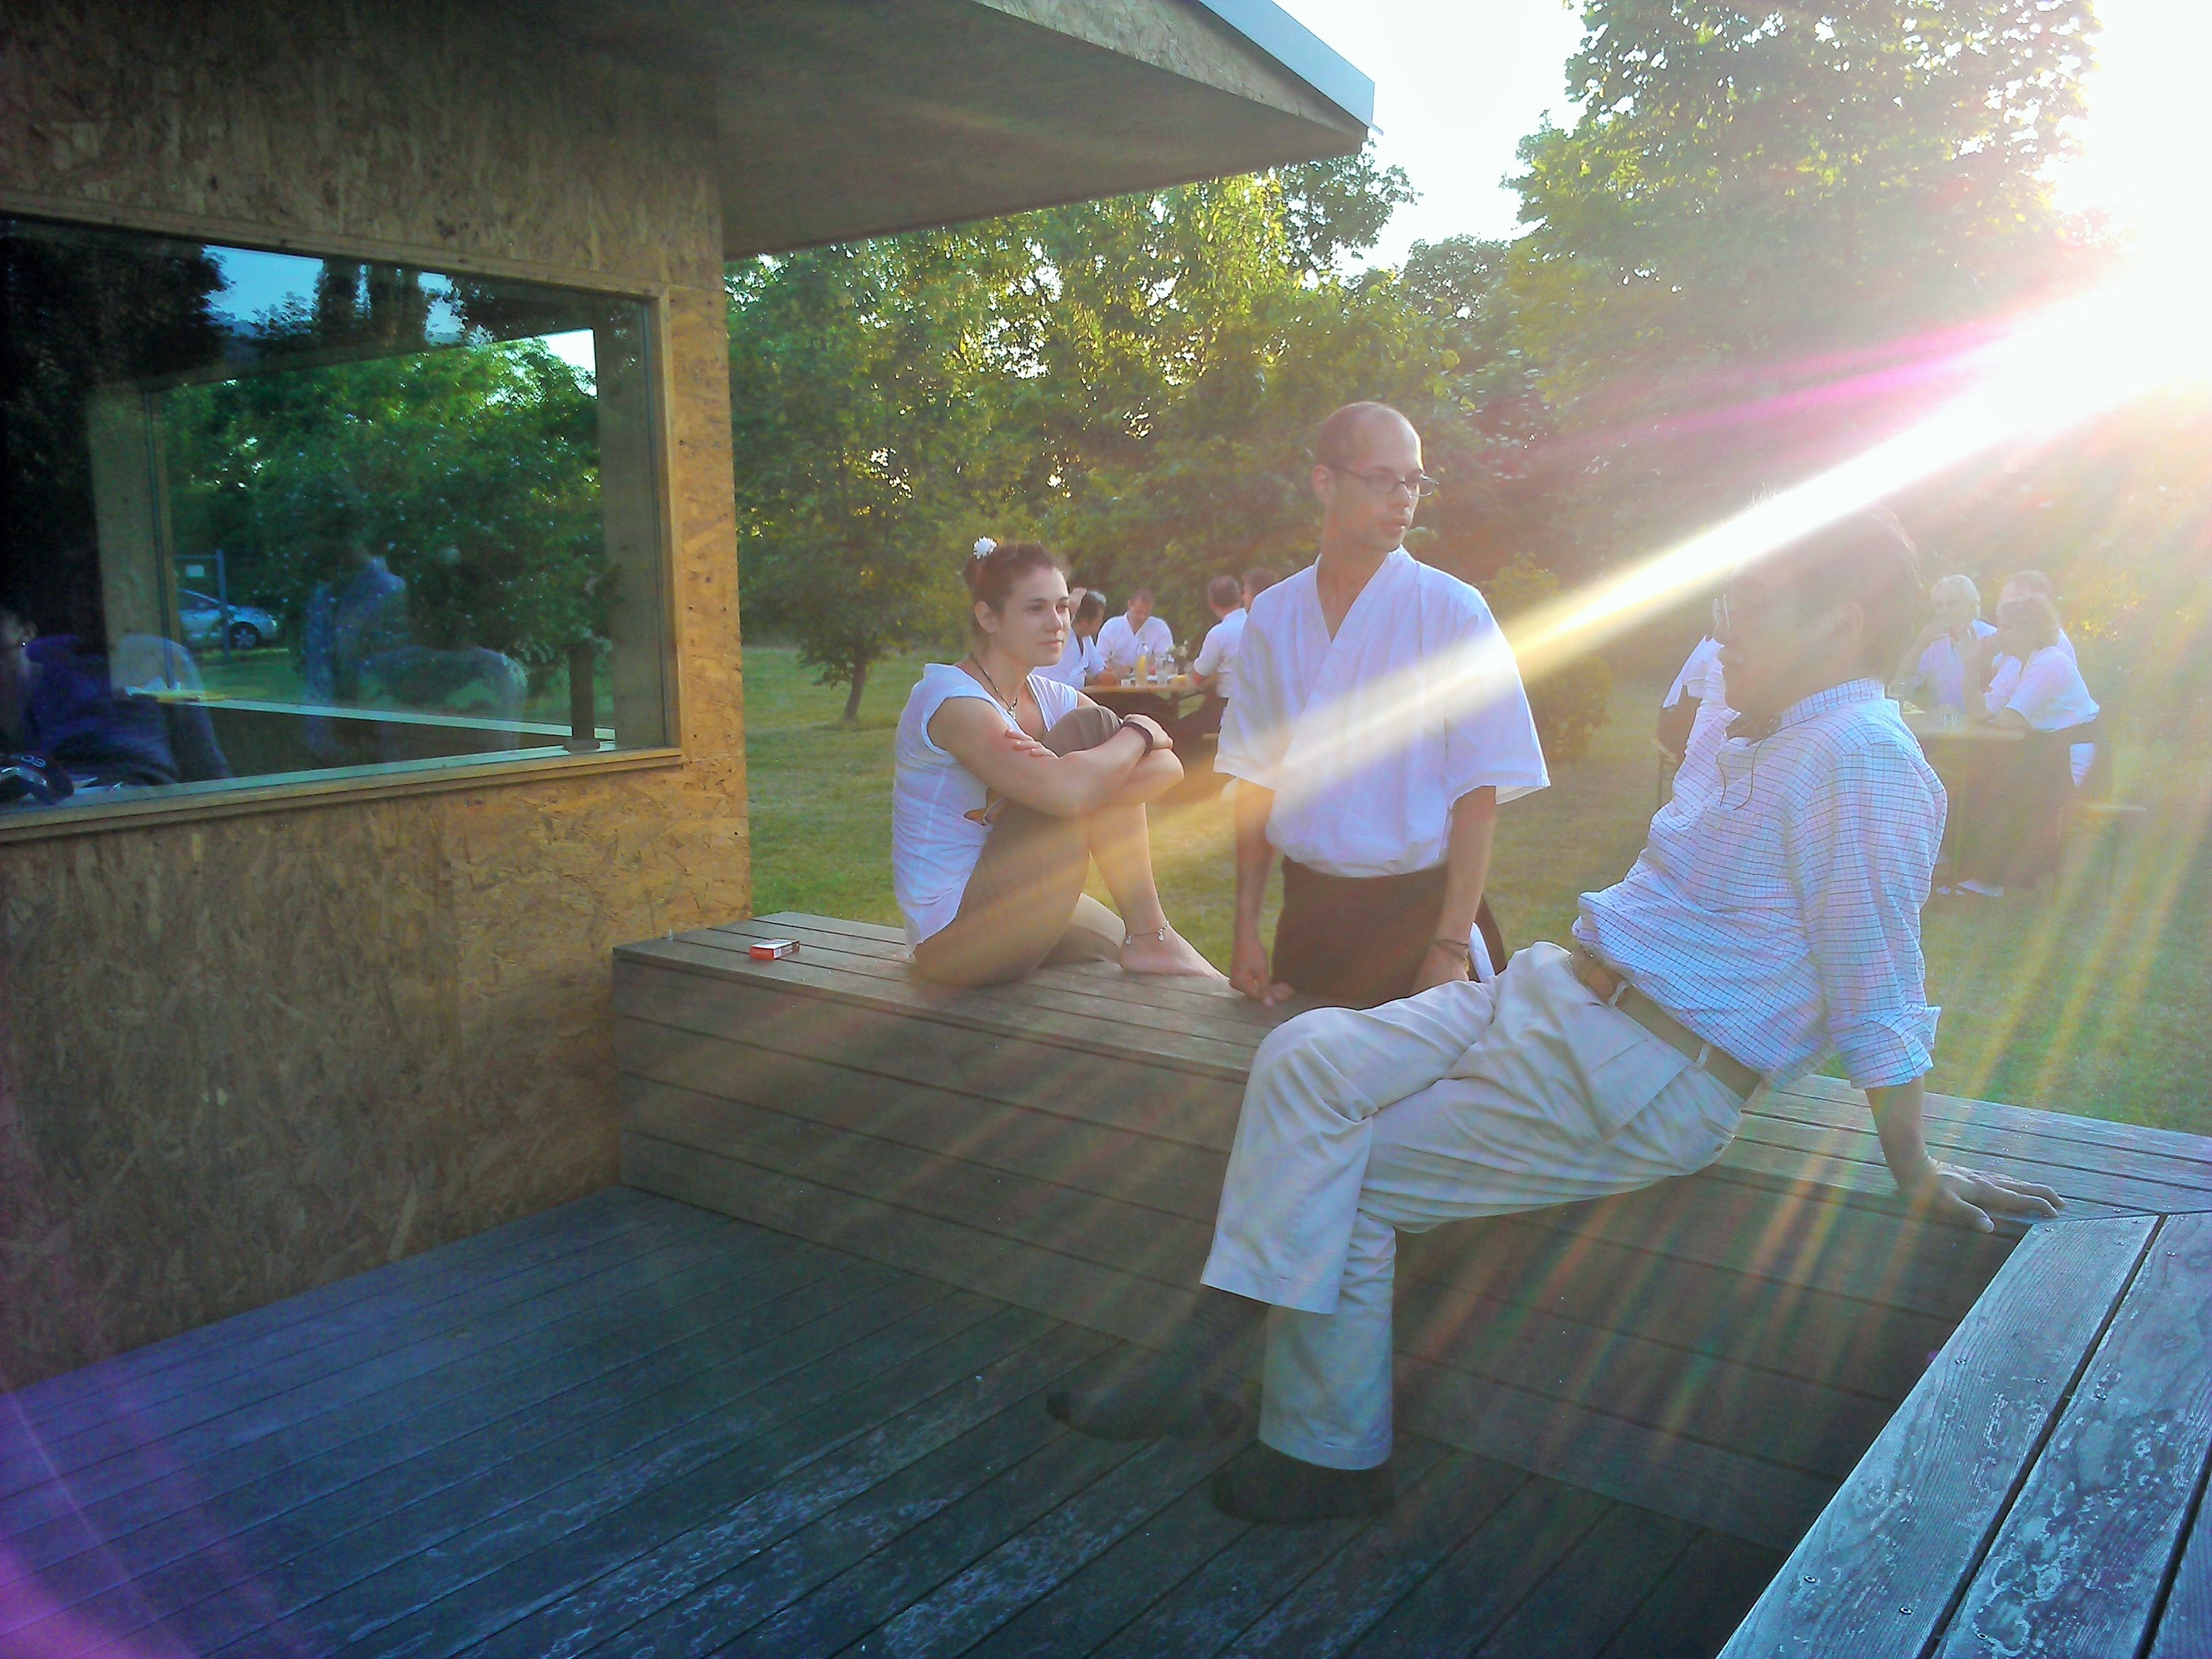 04.06.2015, Seminar Shibata XXI, japanischer Abend, WP_001305